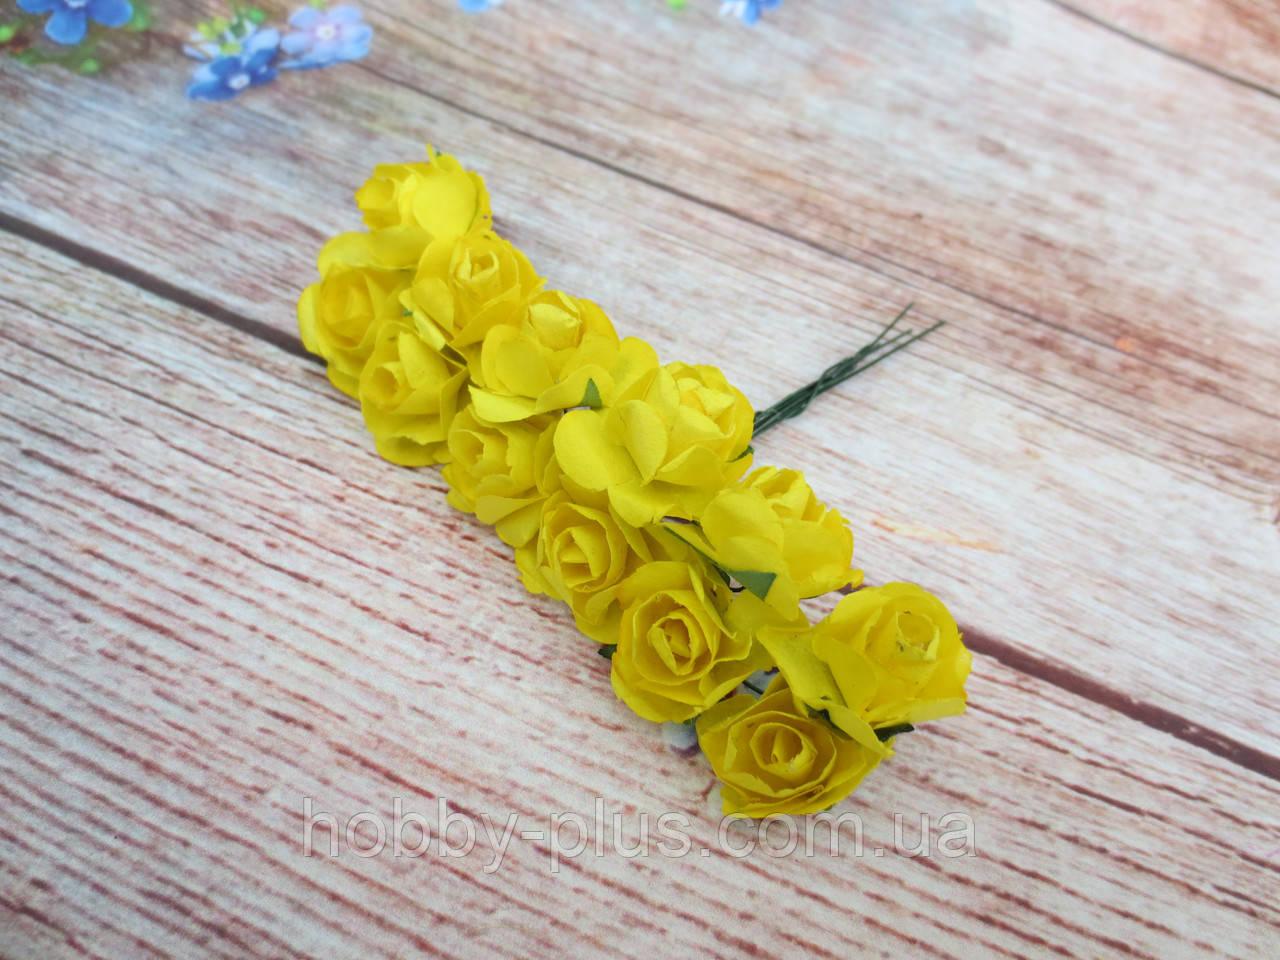 Роза бумажная, d 1,5 см, цвет ЖЕЛТЫЙ, 12 шт/упаковка